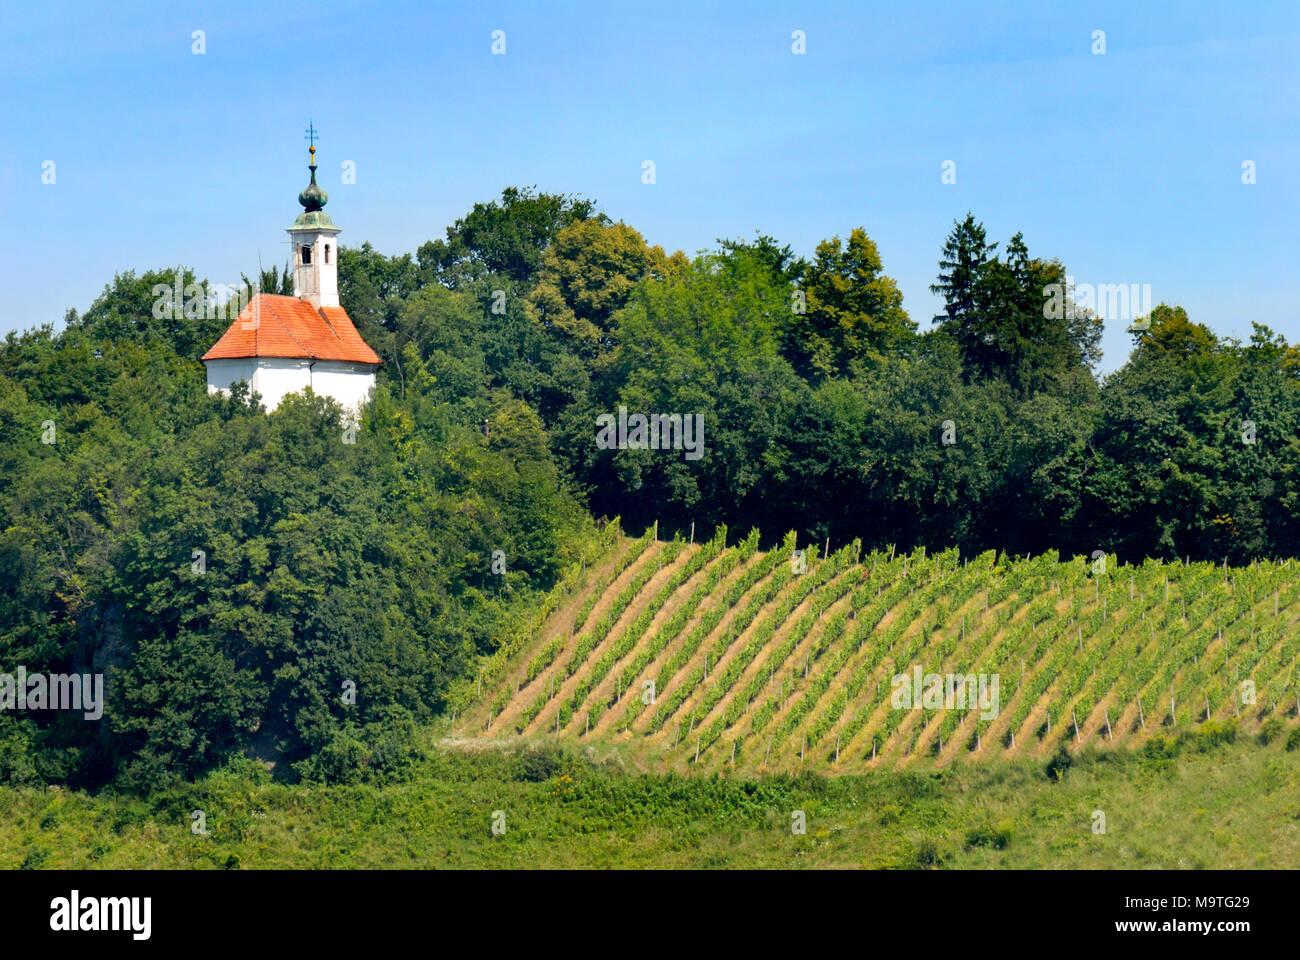 Maribor, Stajerska, Slovenia. Kalvaria, Church of St Barbara (Za Kalvarijo: 1681) and vineyard seen from top of Cathedral tower - Stock Image